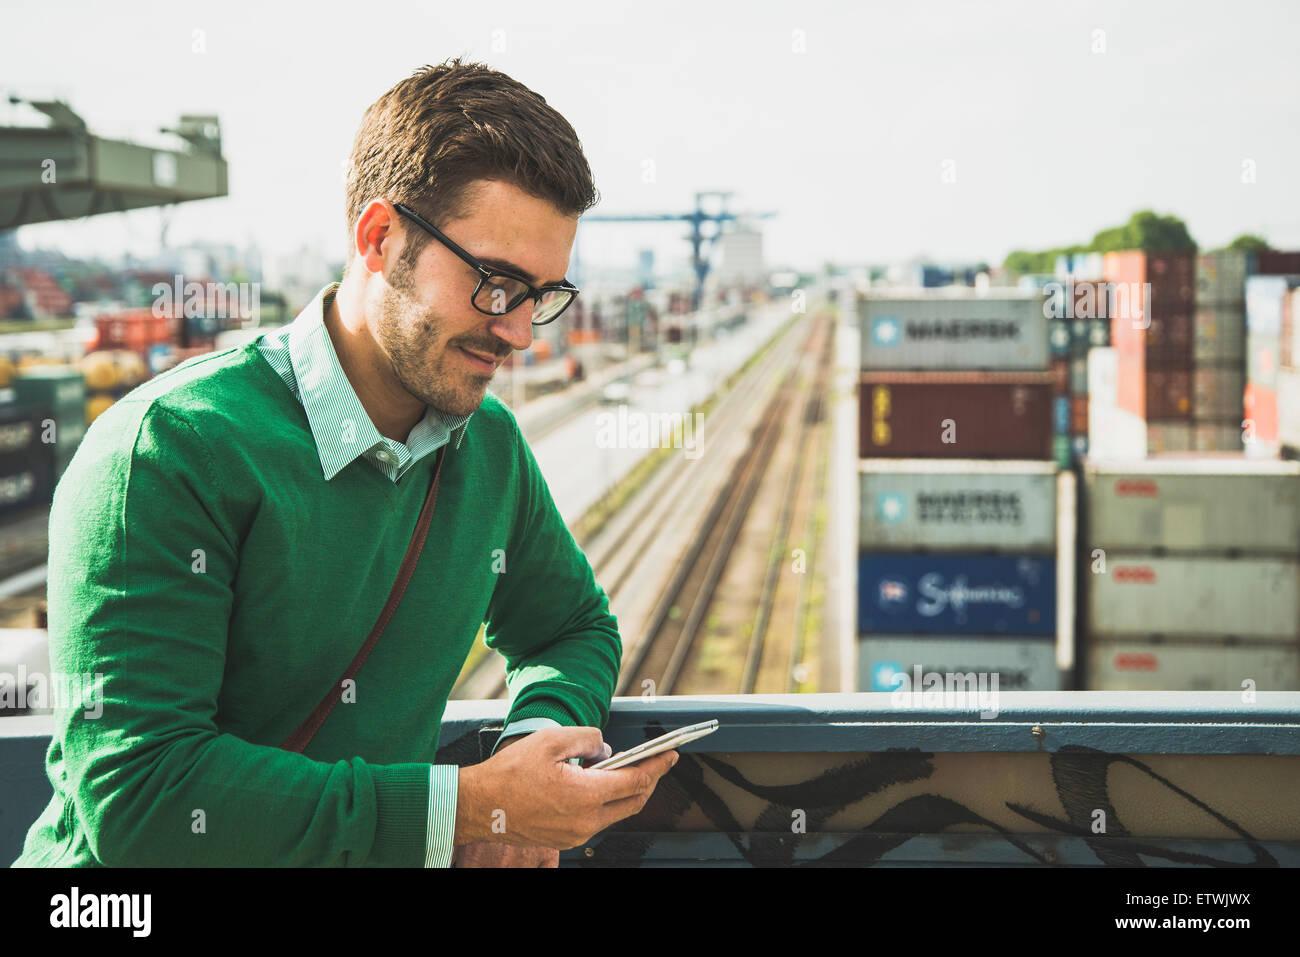 Man at freight yard looking at cell phone - Stock Image